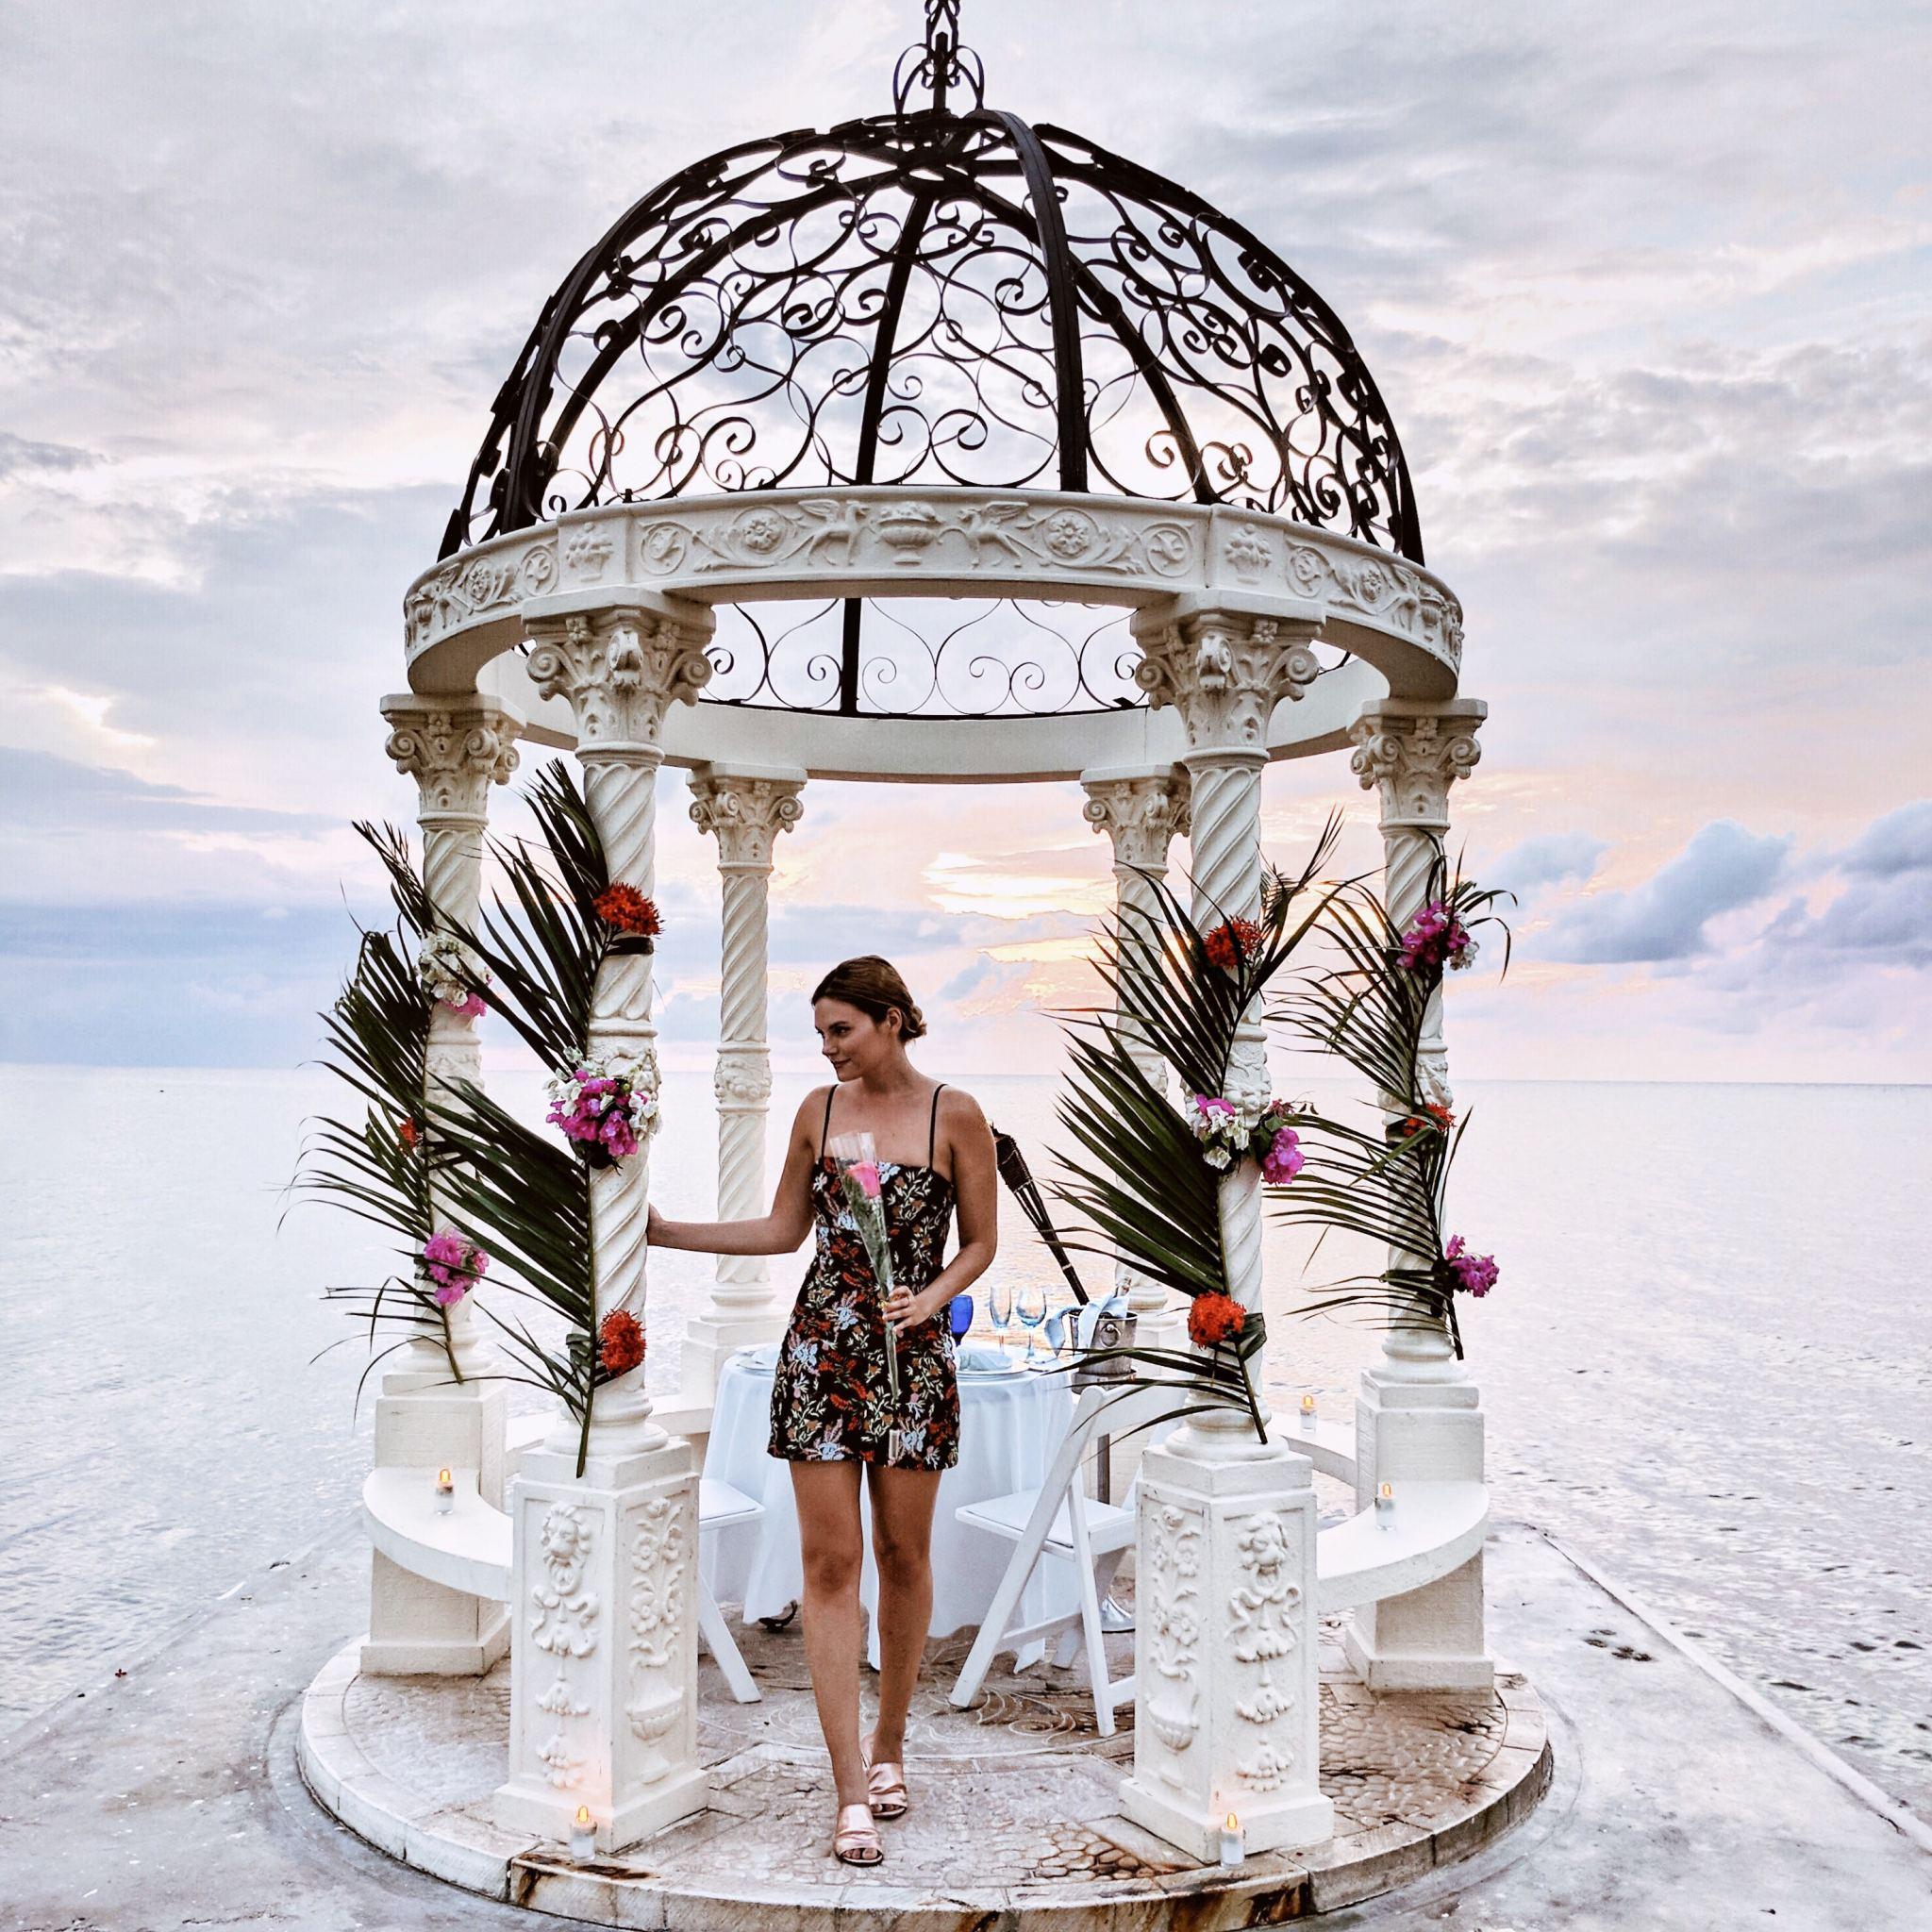 sandals resort montego bay jesschamilton candlelight dinner